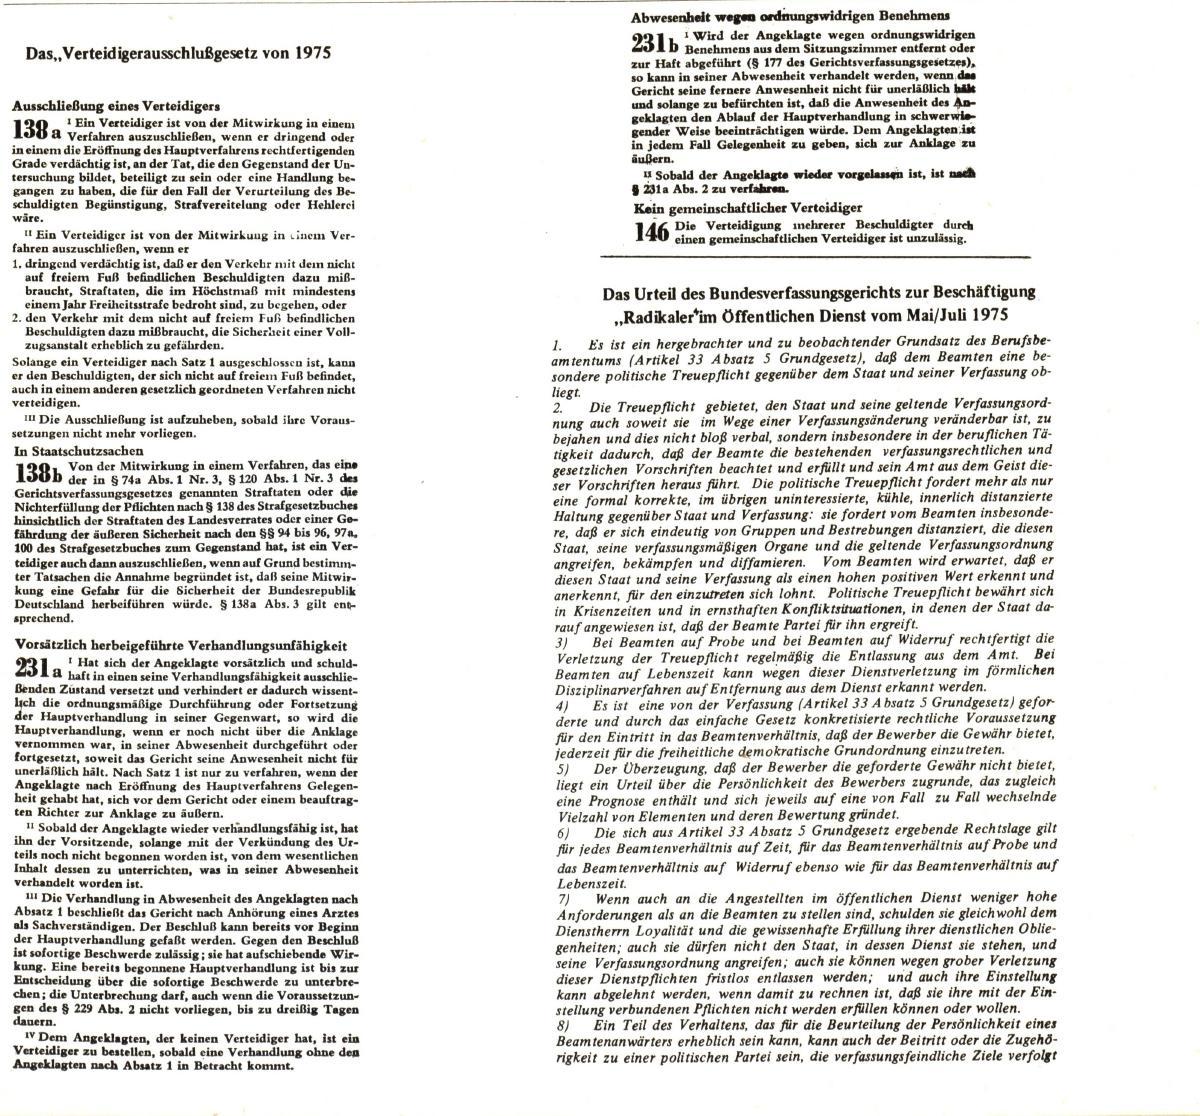 REP_VLB_1976_Die_Zensurgesetze_46